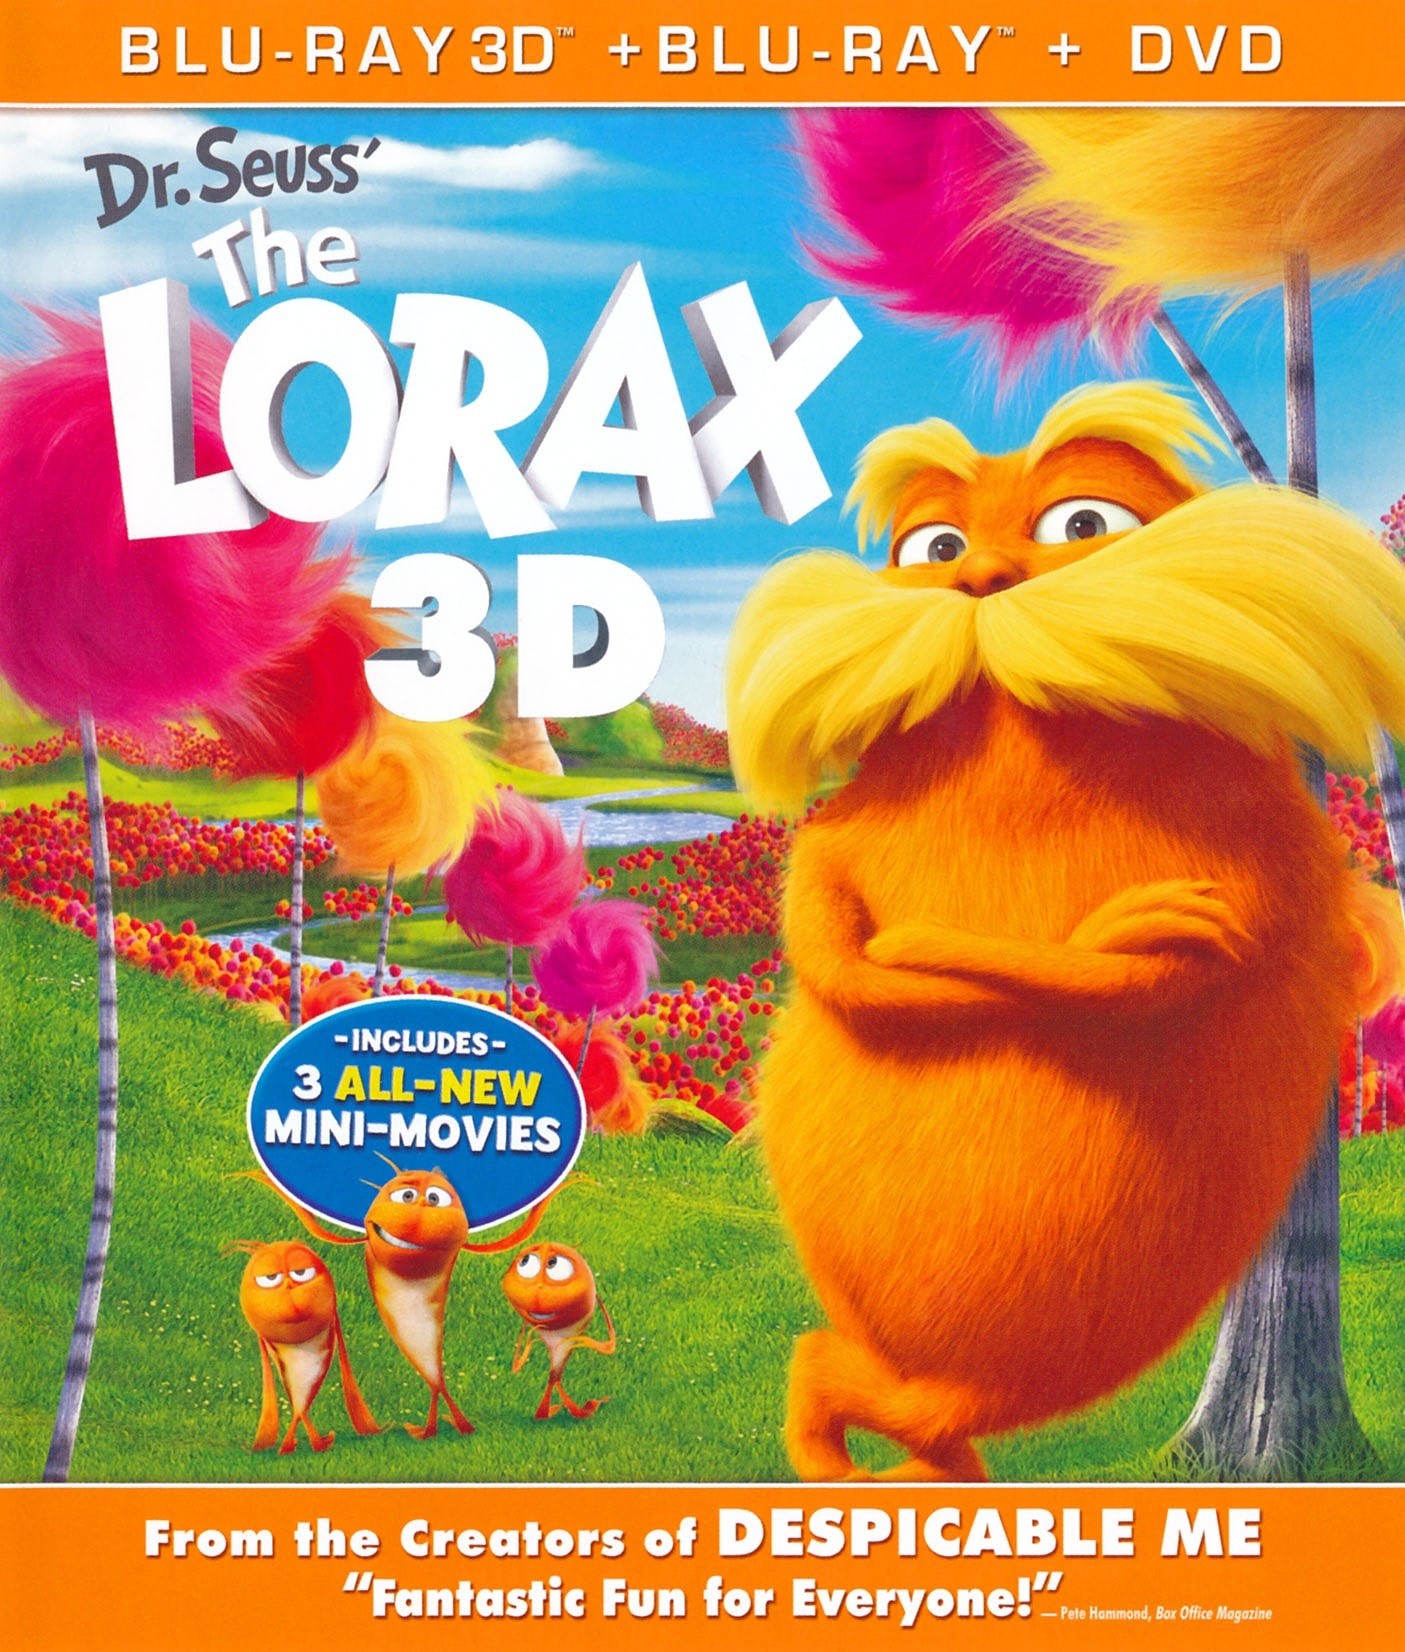 Dr Seuss The Lorax 2012 Blu Ray